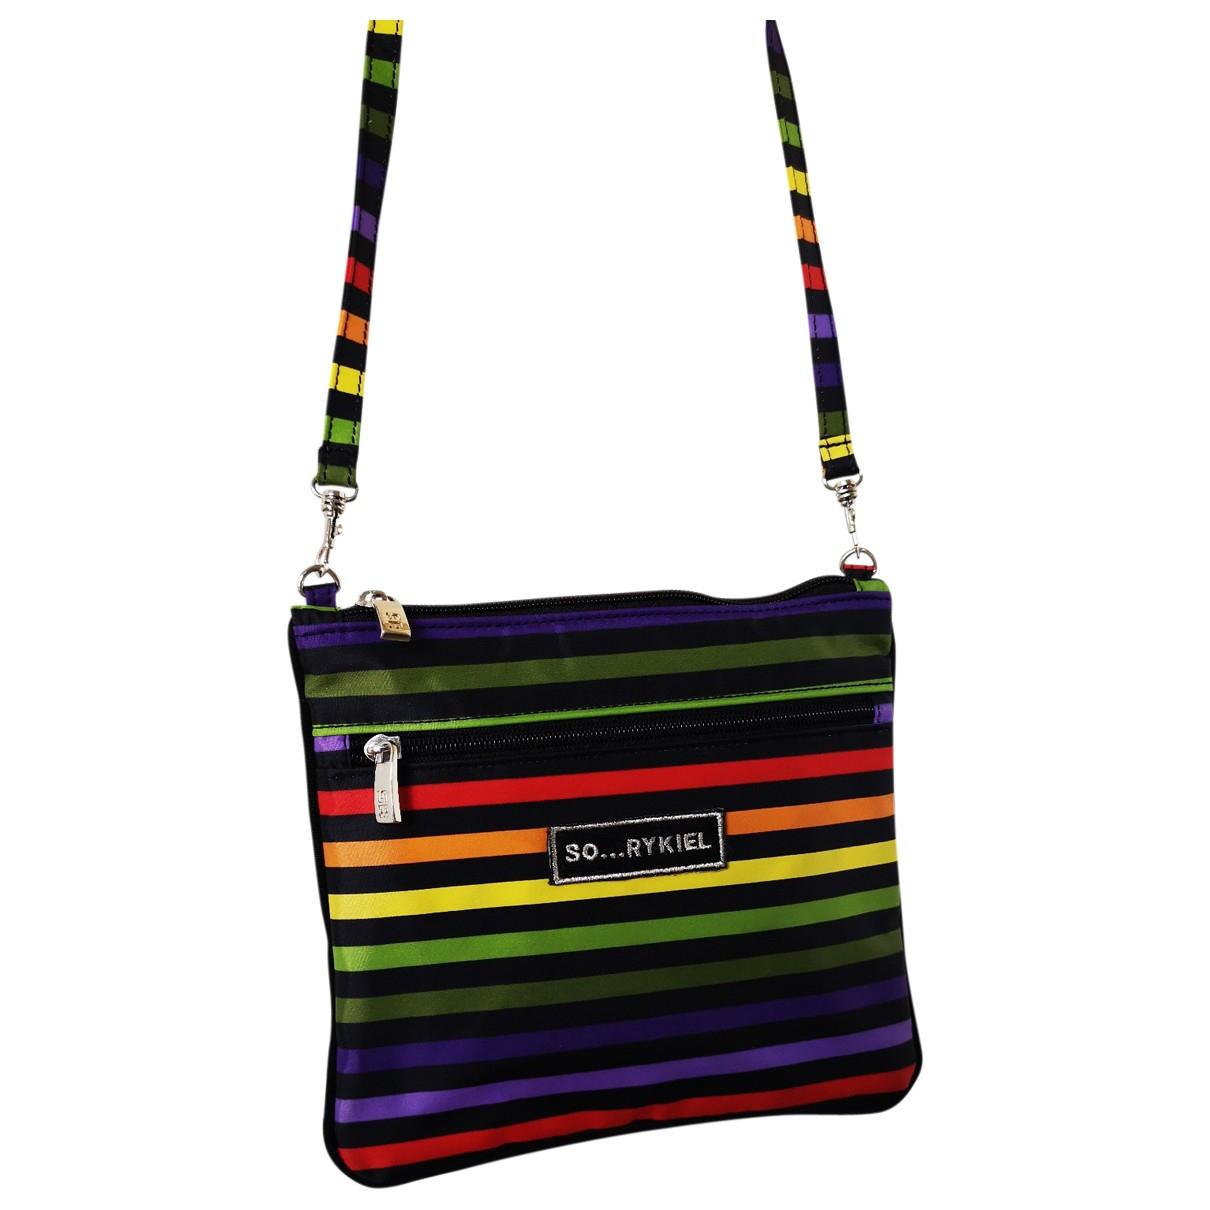 Sonia Rykiel \N Multicolour Cotton Clutch bag for Women \N